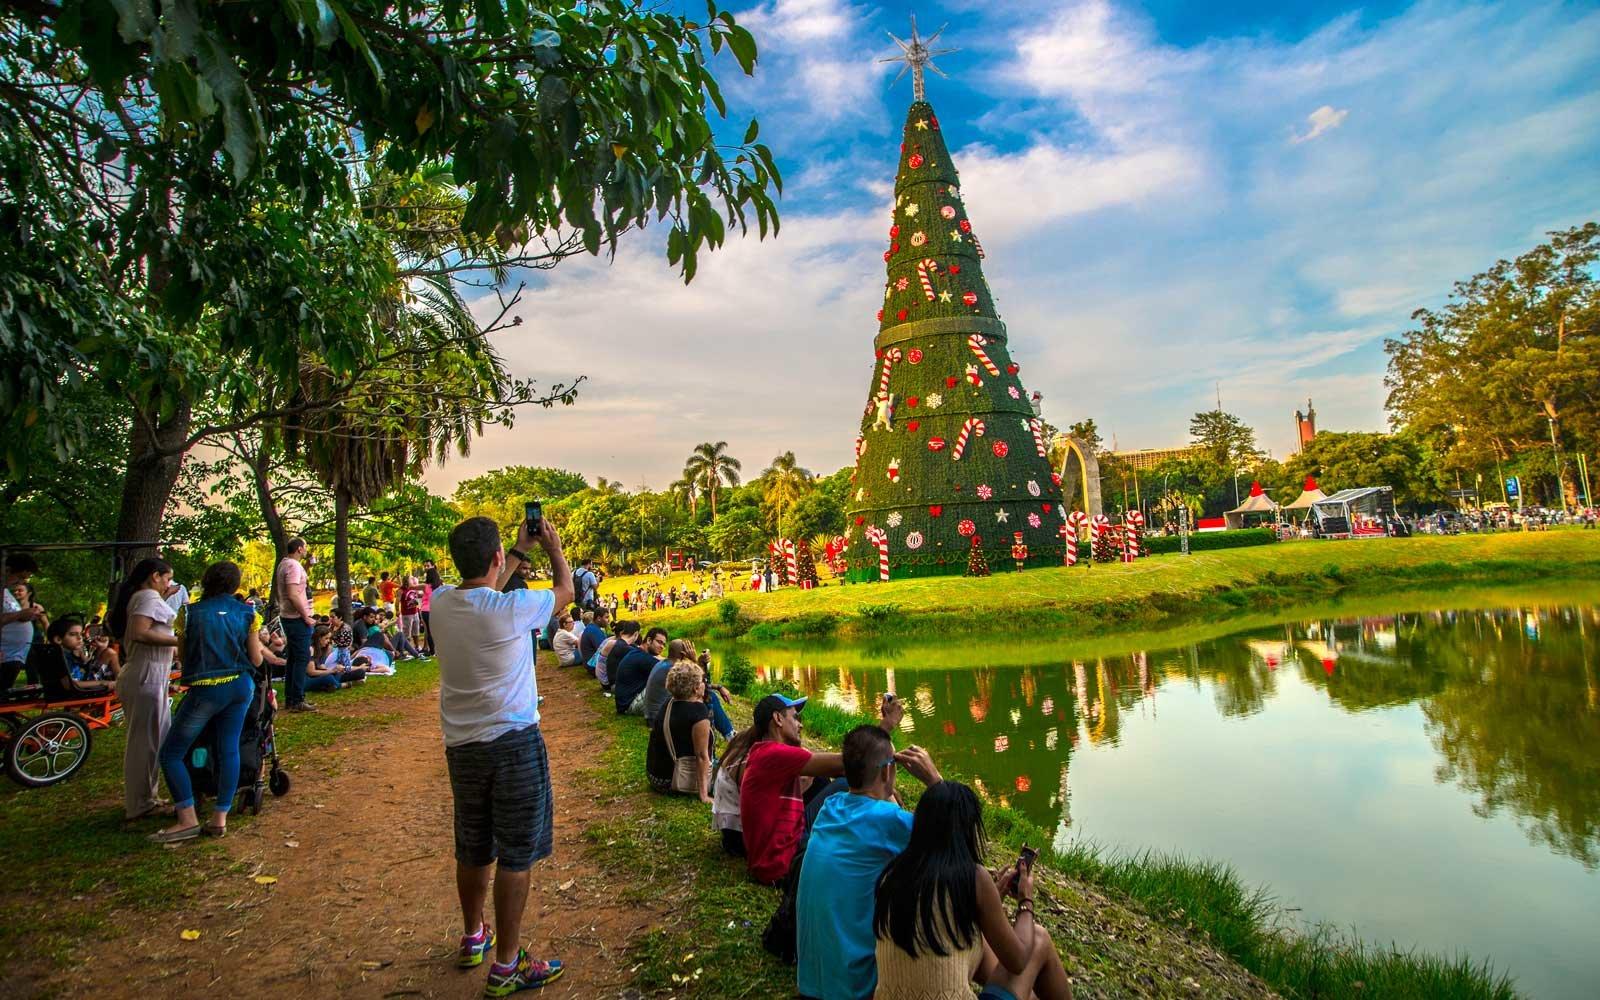 ibirapuera-park-christmas-tree-brazil-christmastrees1217.jpg